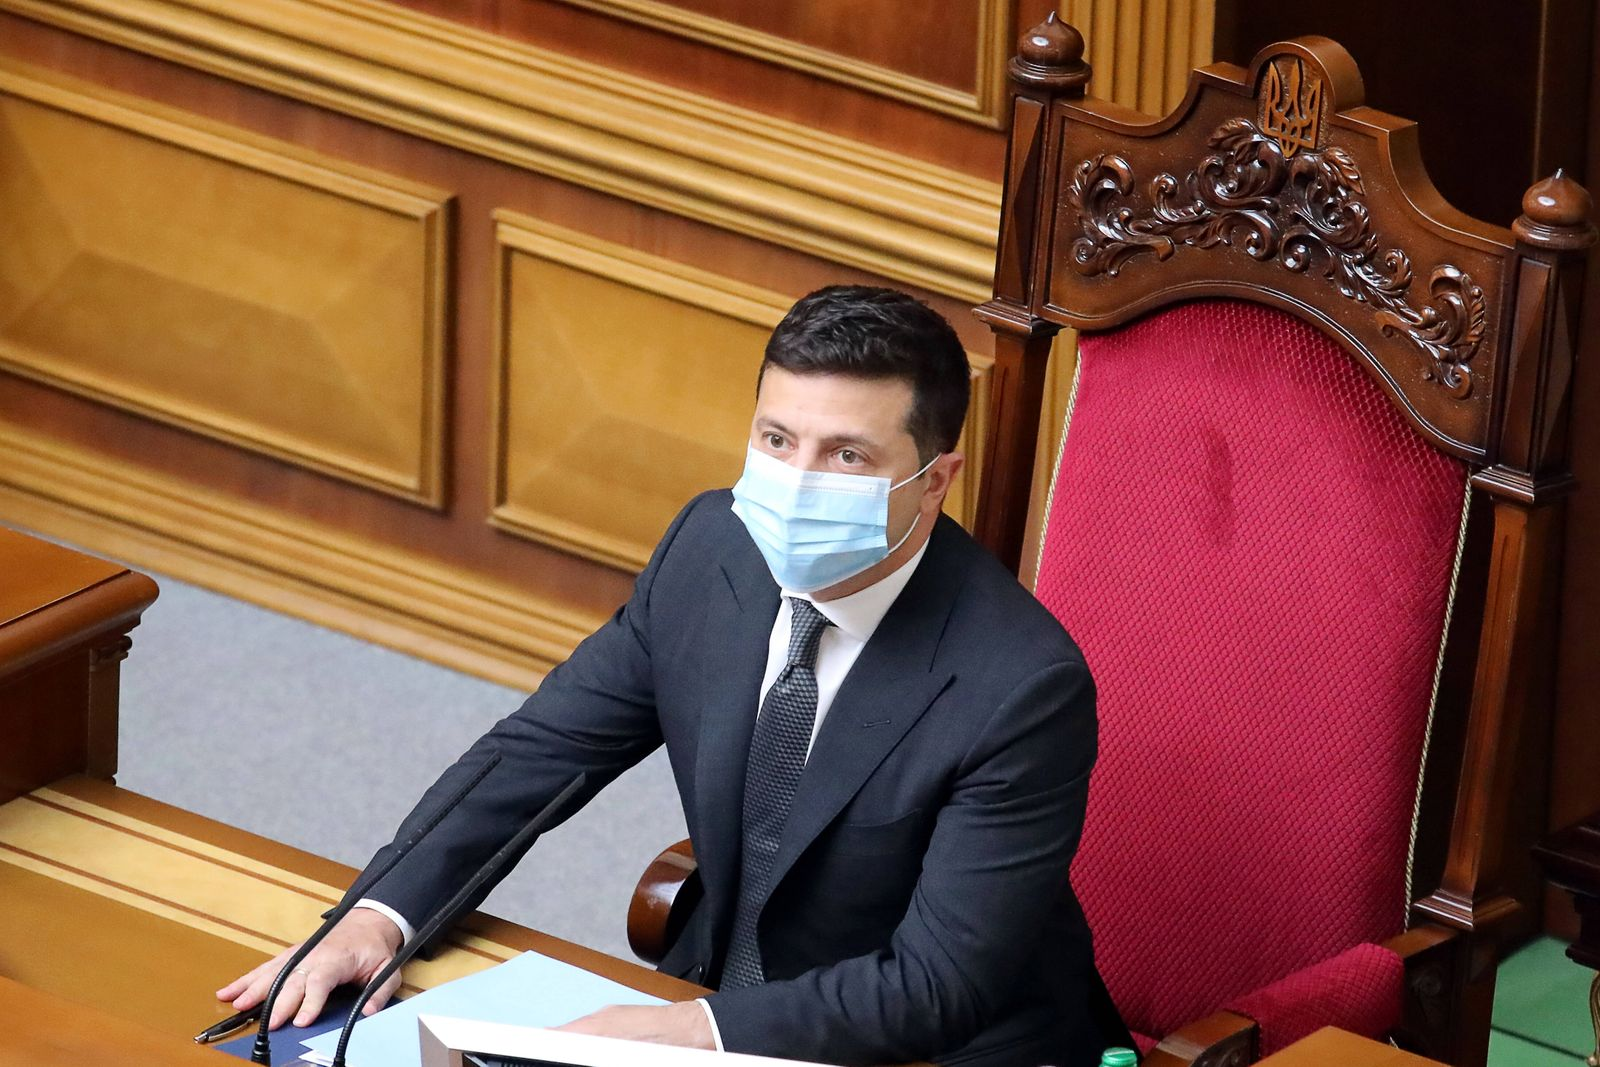 KIEV, UKRAINE - OCTOBER 20, 2020: Ukraine s President Volodymyr Zelensky attends a meeting of the Verkhovna Rada to del